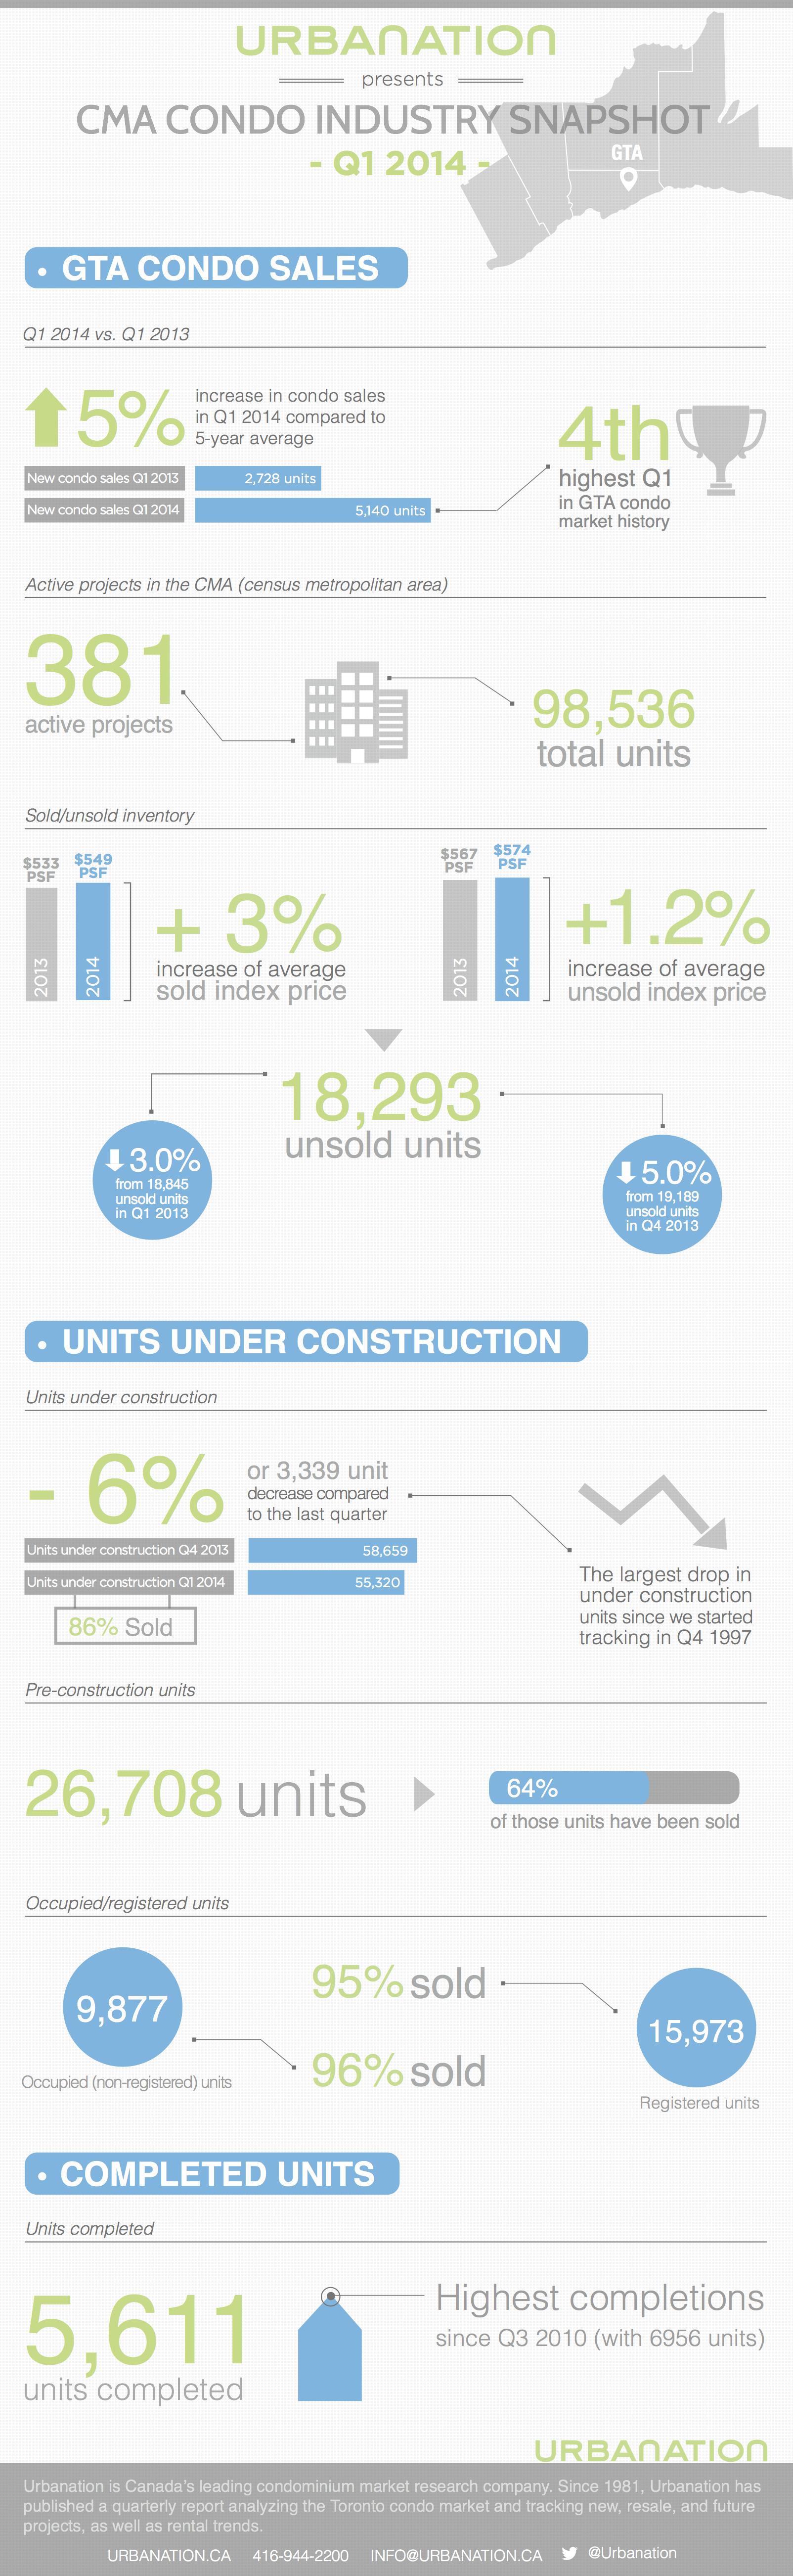 Urbanation Infographic Q1 2014